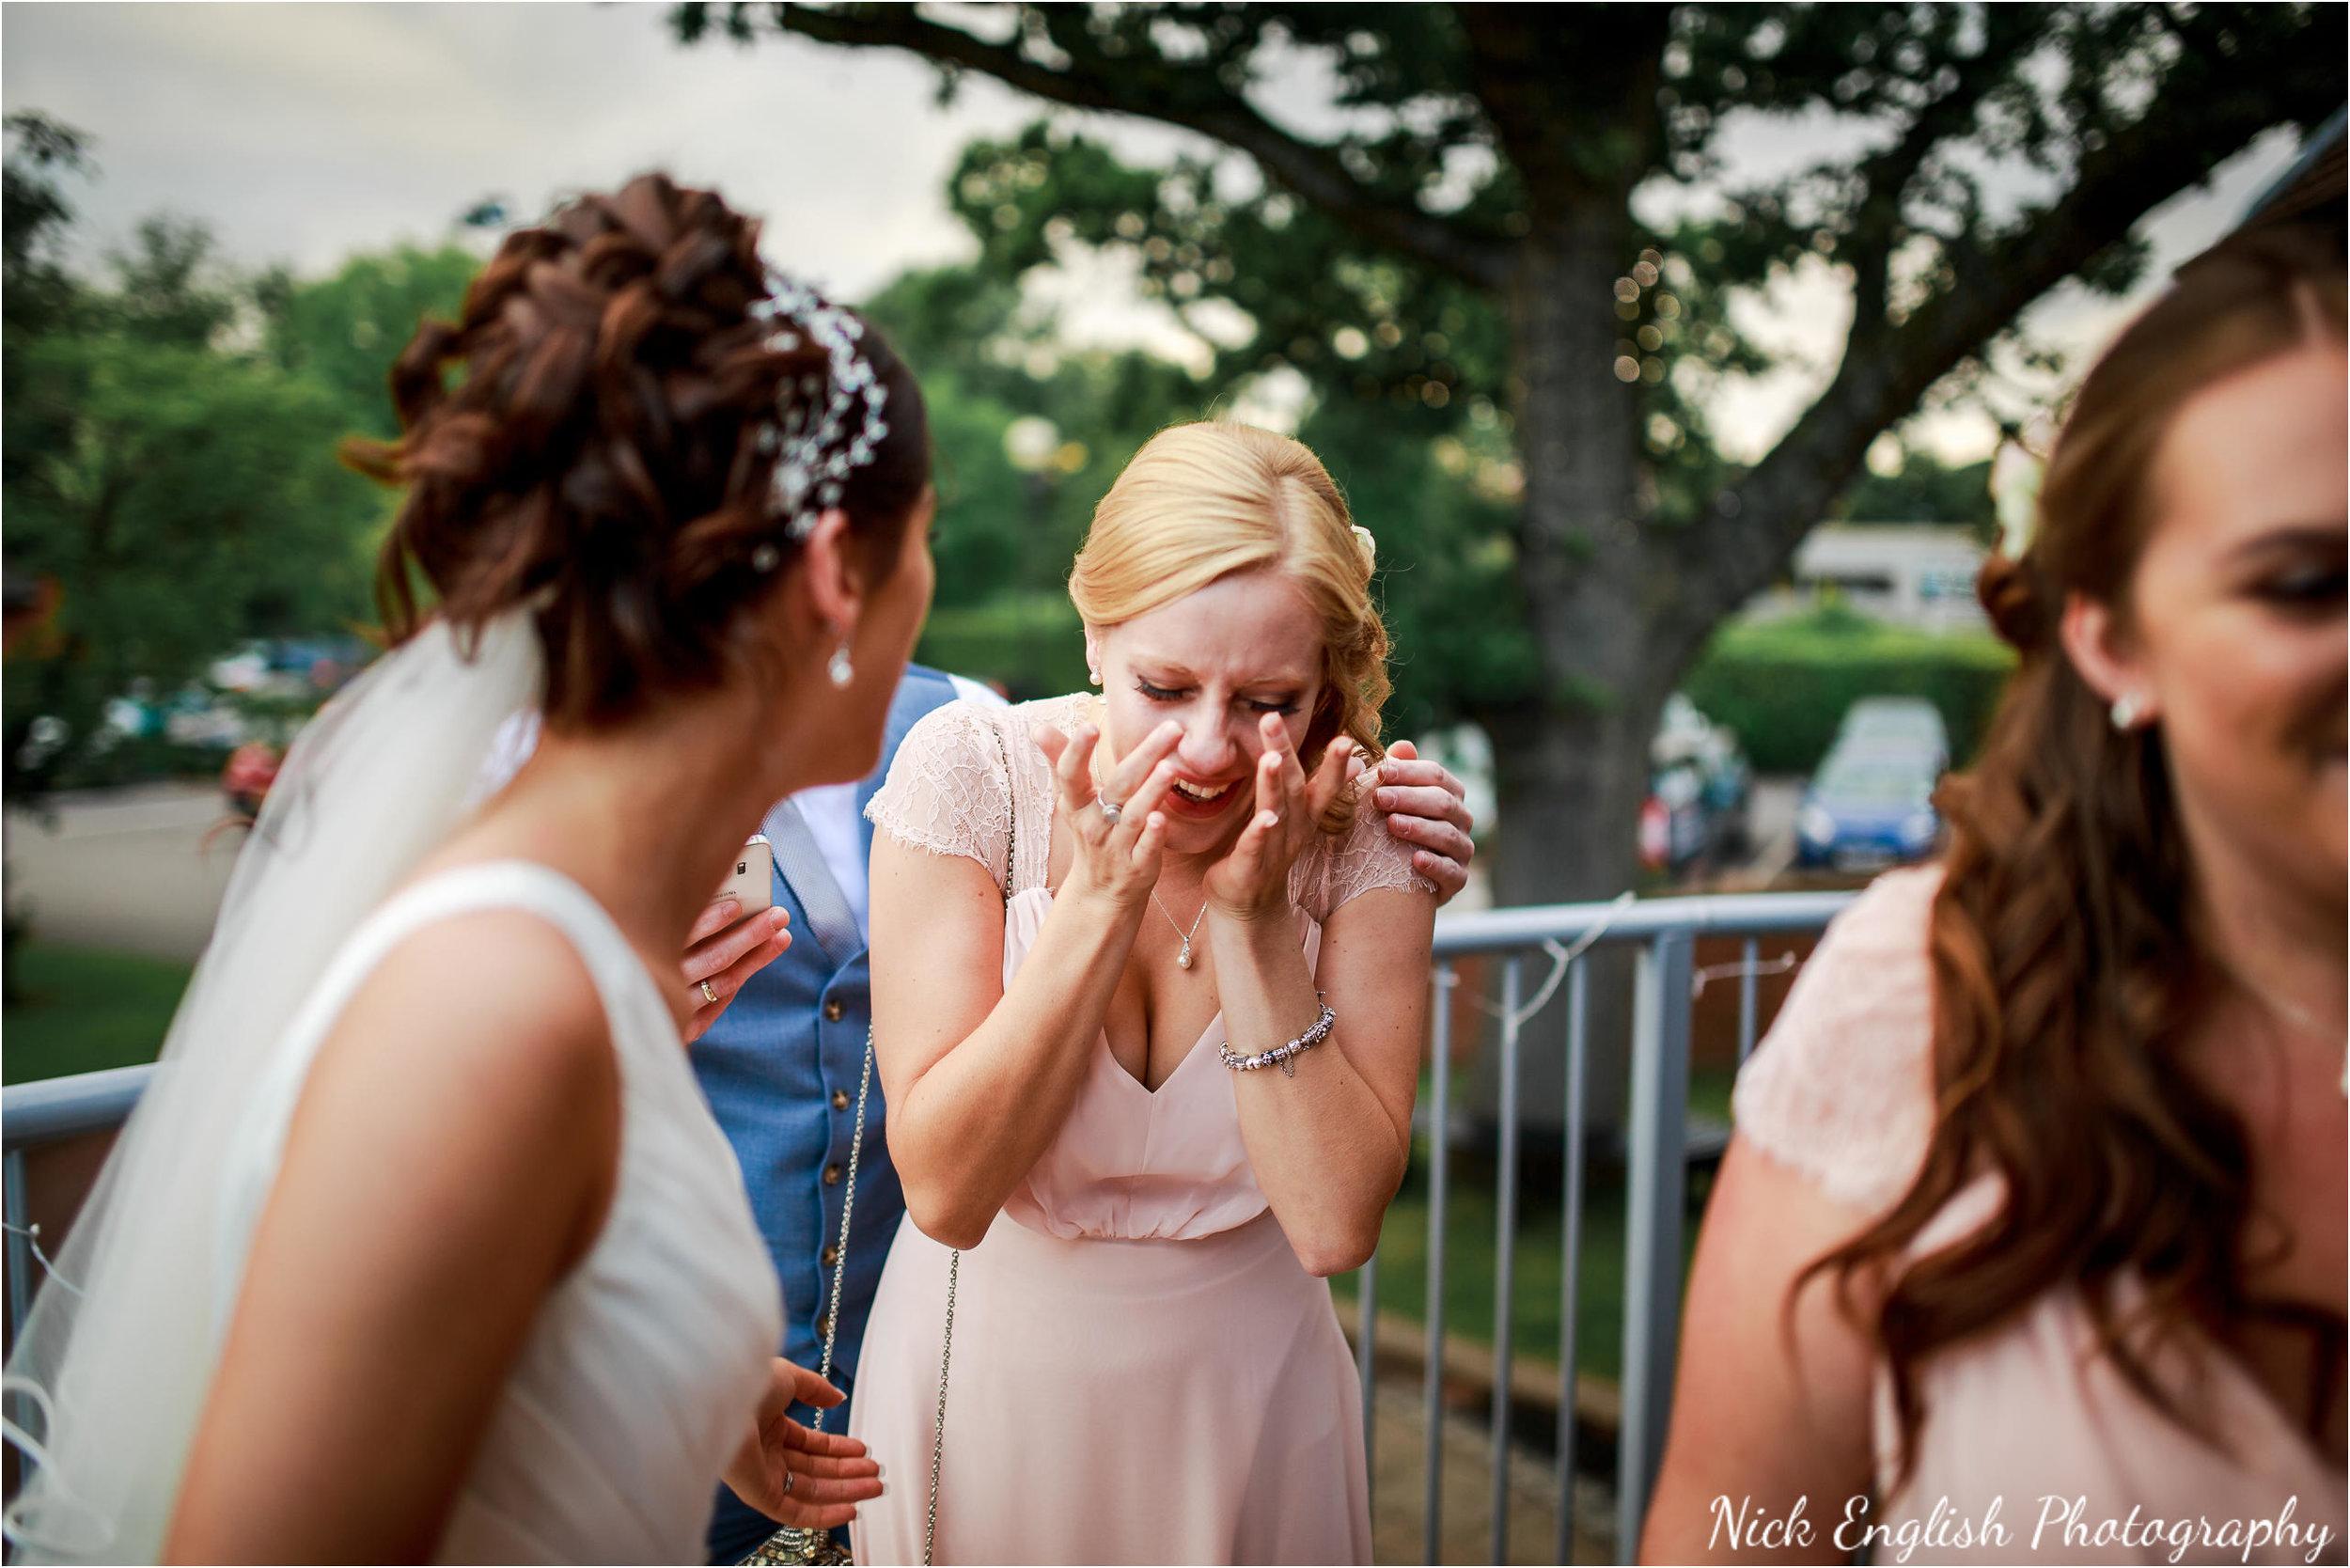 Emily David Wedding Photographs at Barton Grange Preston by Nick English Photography 213jpg.jpeg